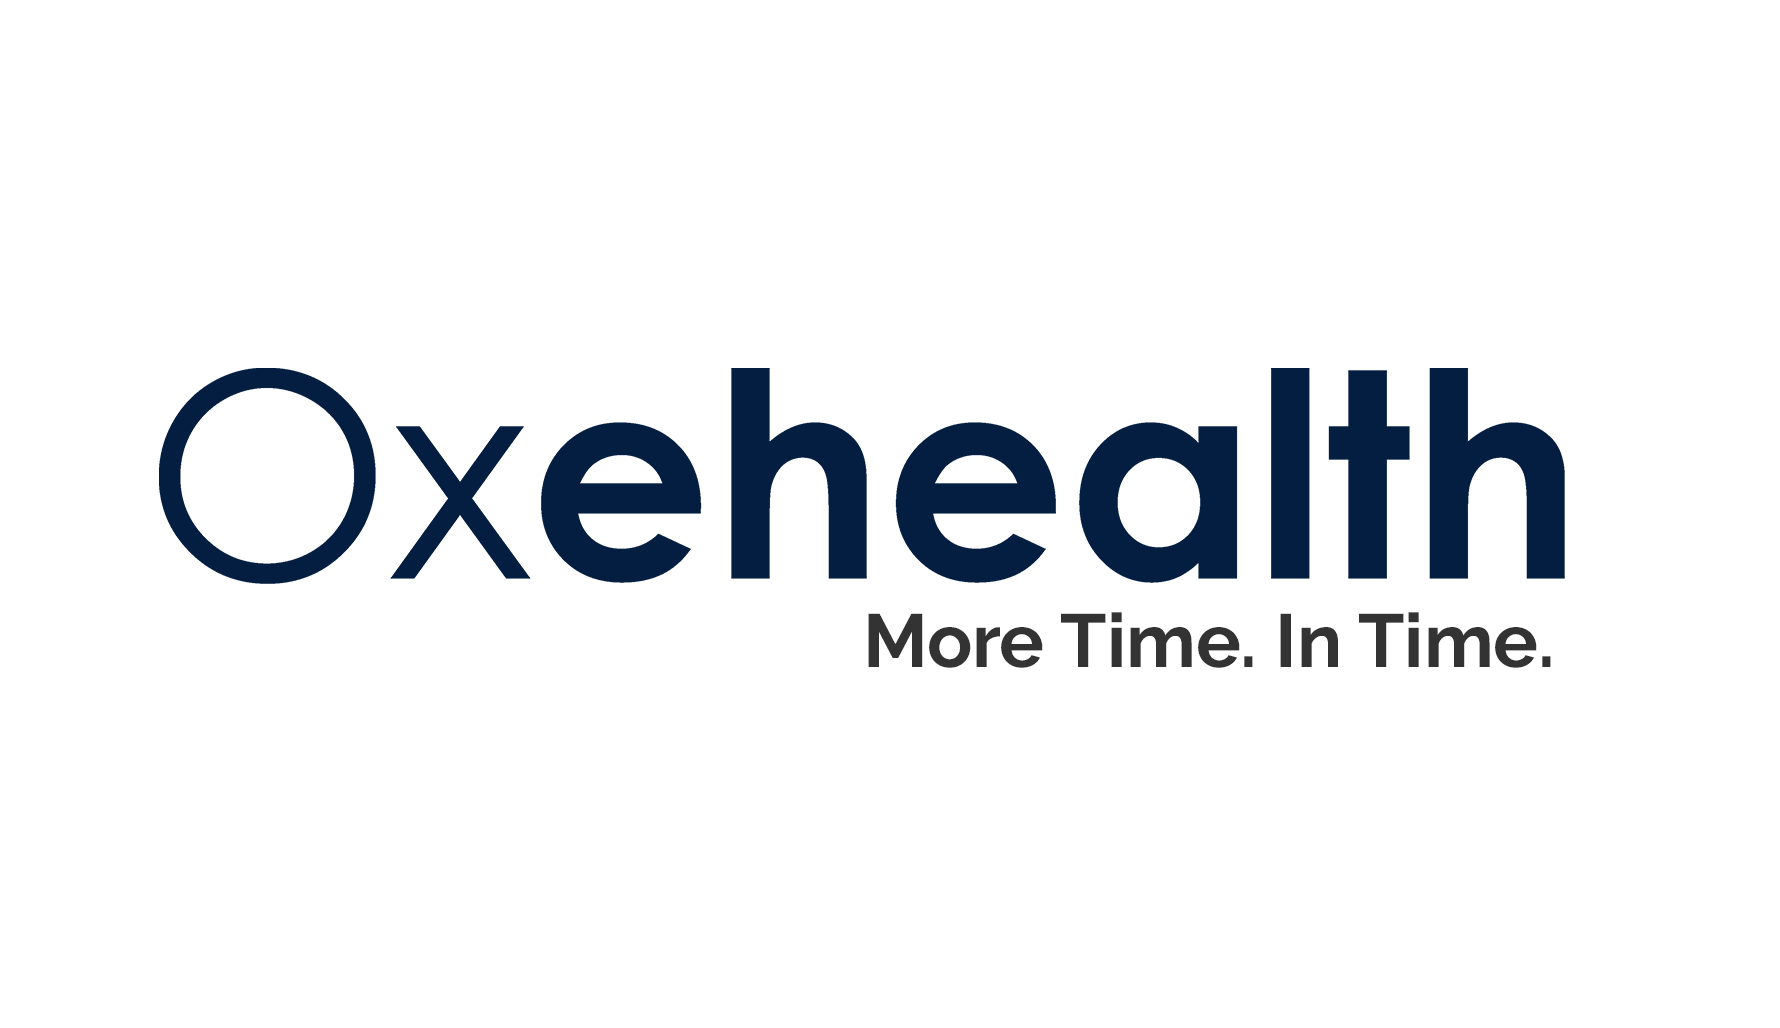 Oxehealth logo